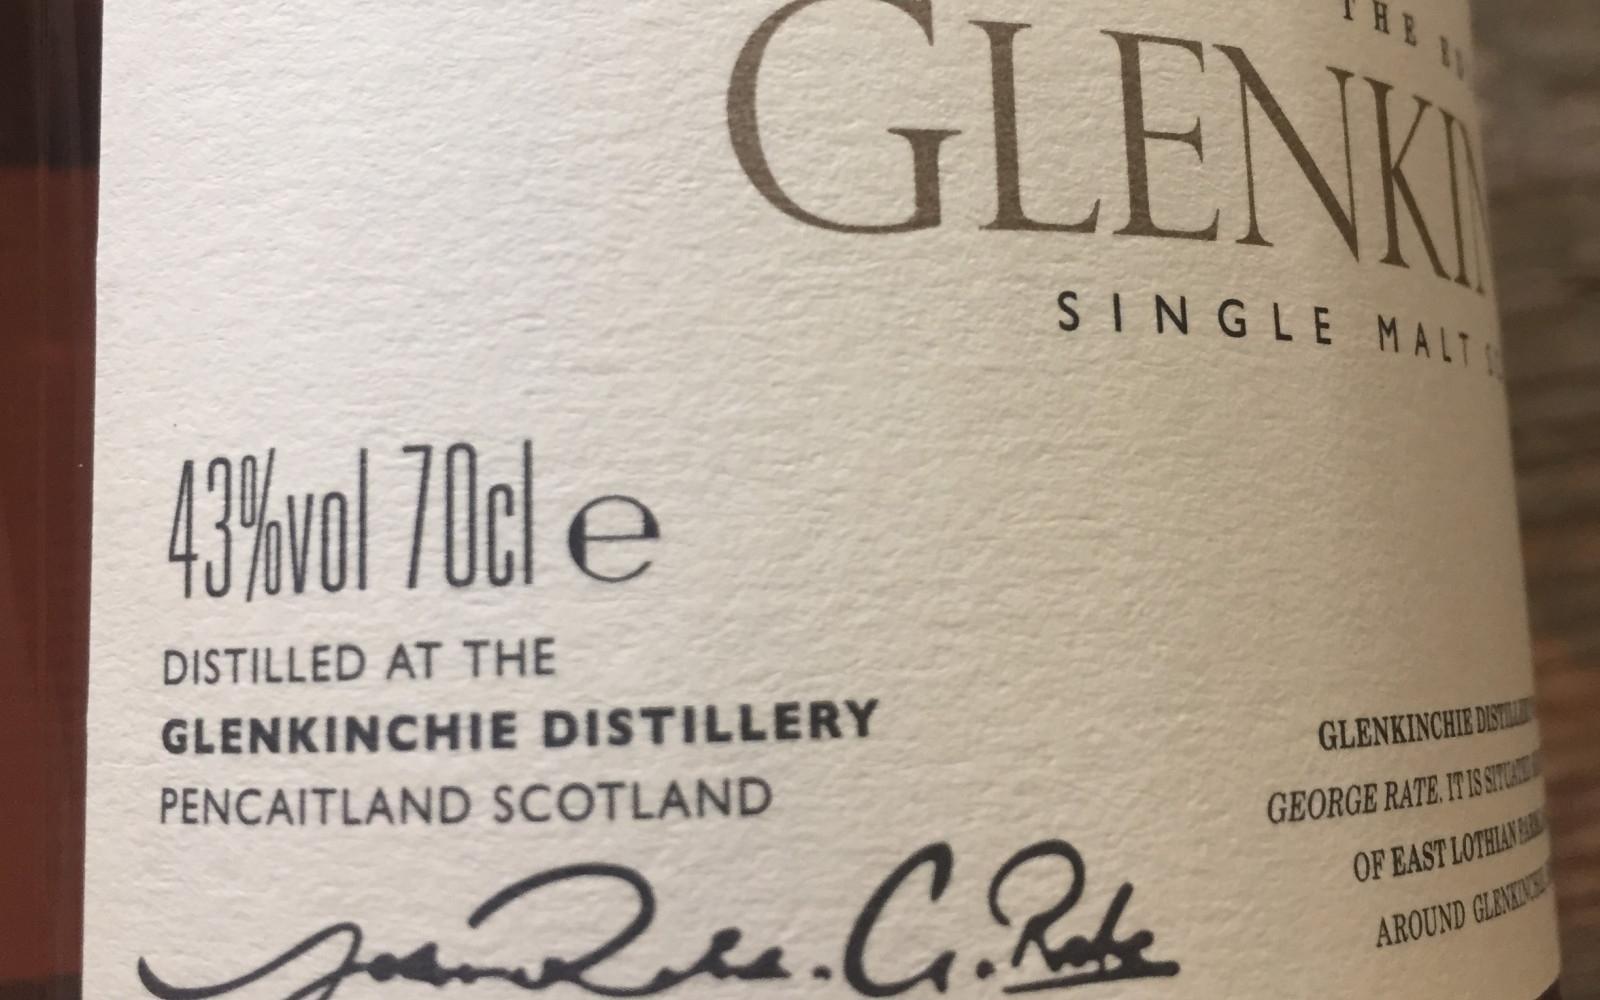 Glenkinchie 12 YO - 43% ABV and 700ml bottle size